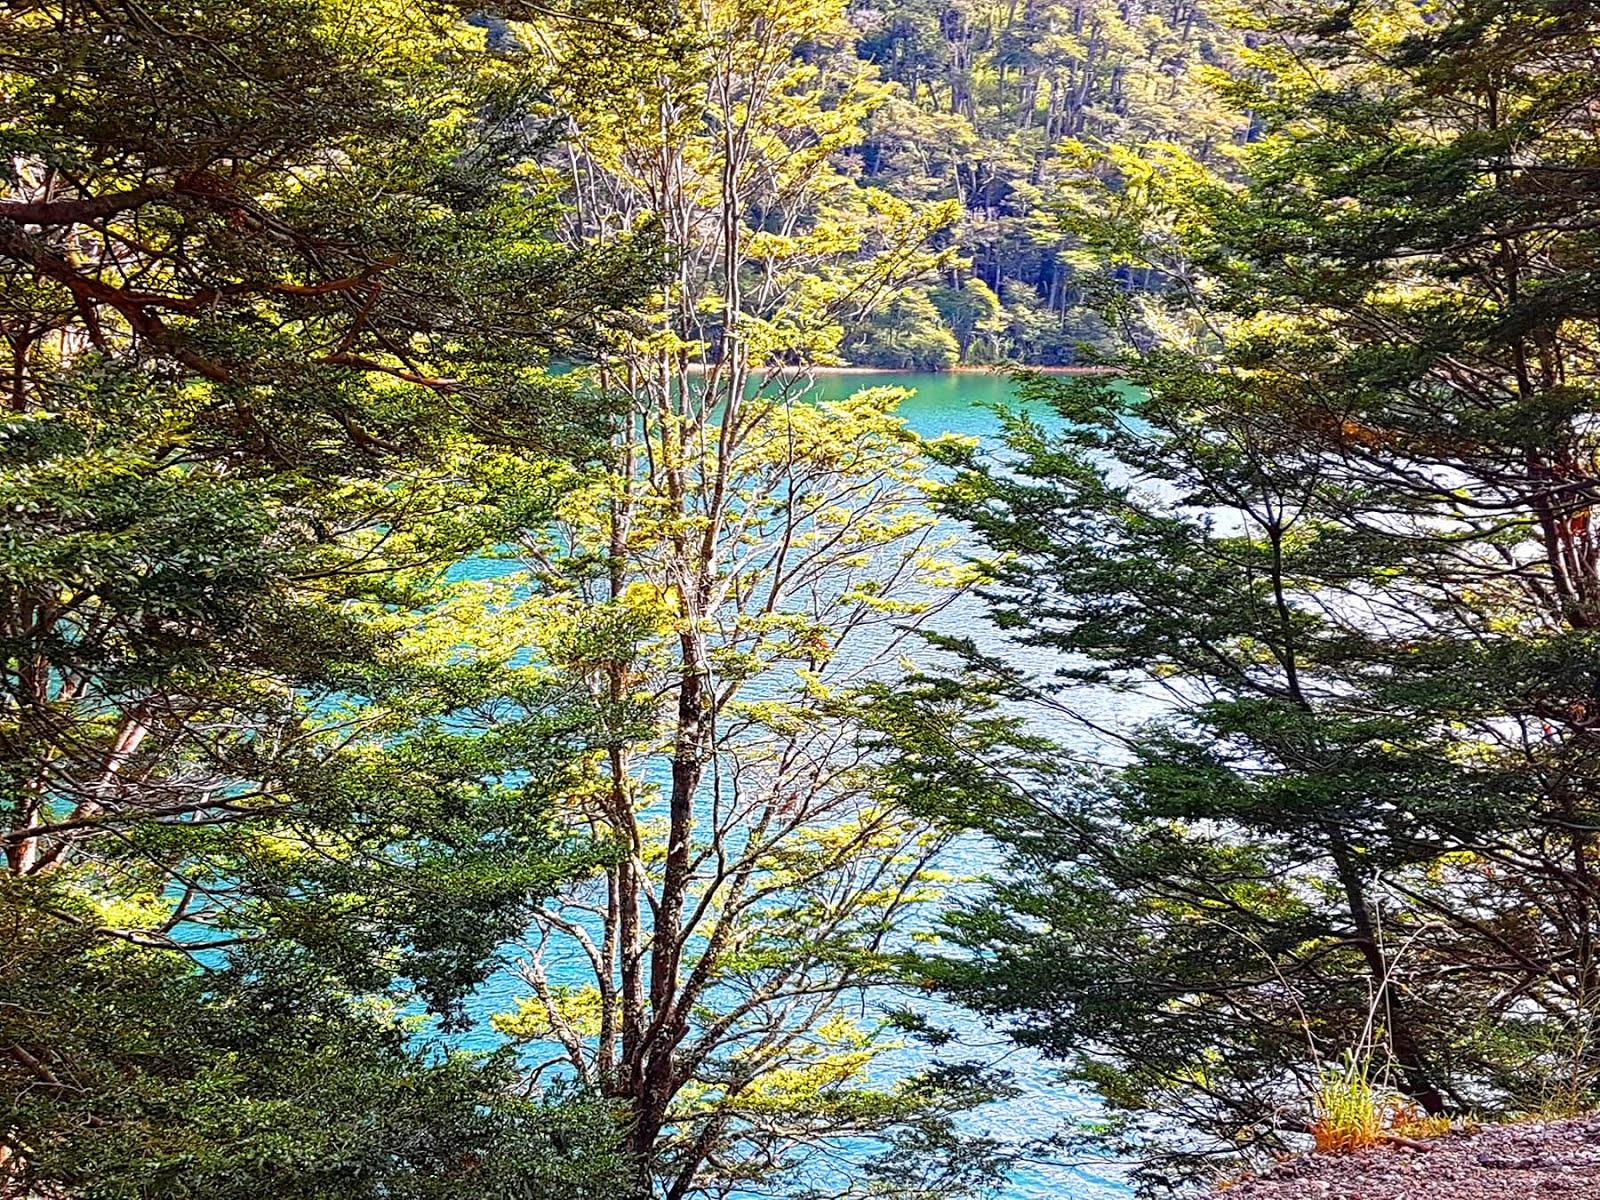 Lago Escondido, Rota dos 7 Lagos, Patagonia Argentina.